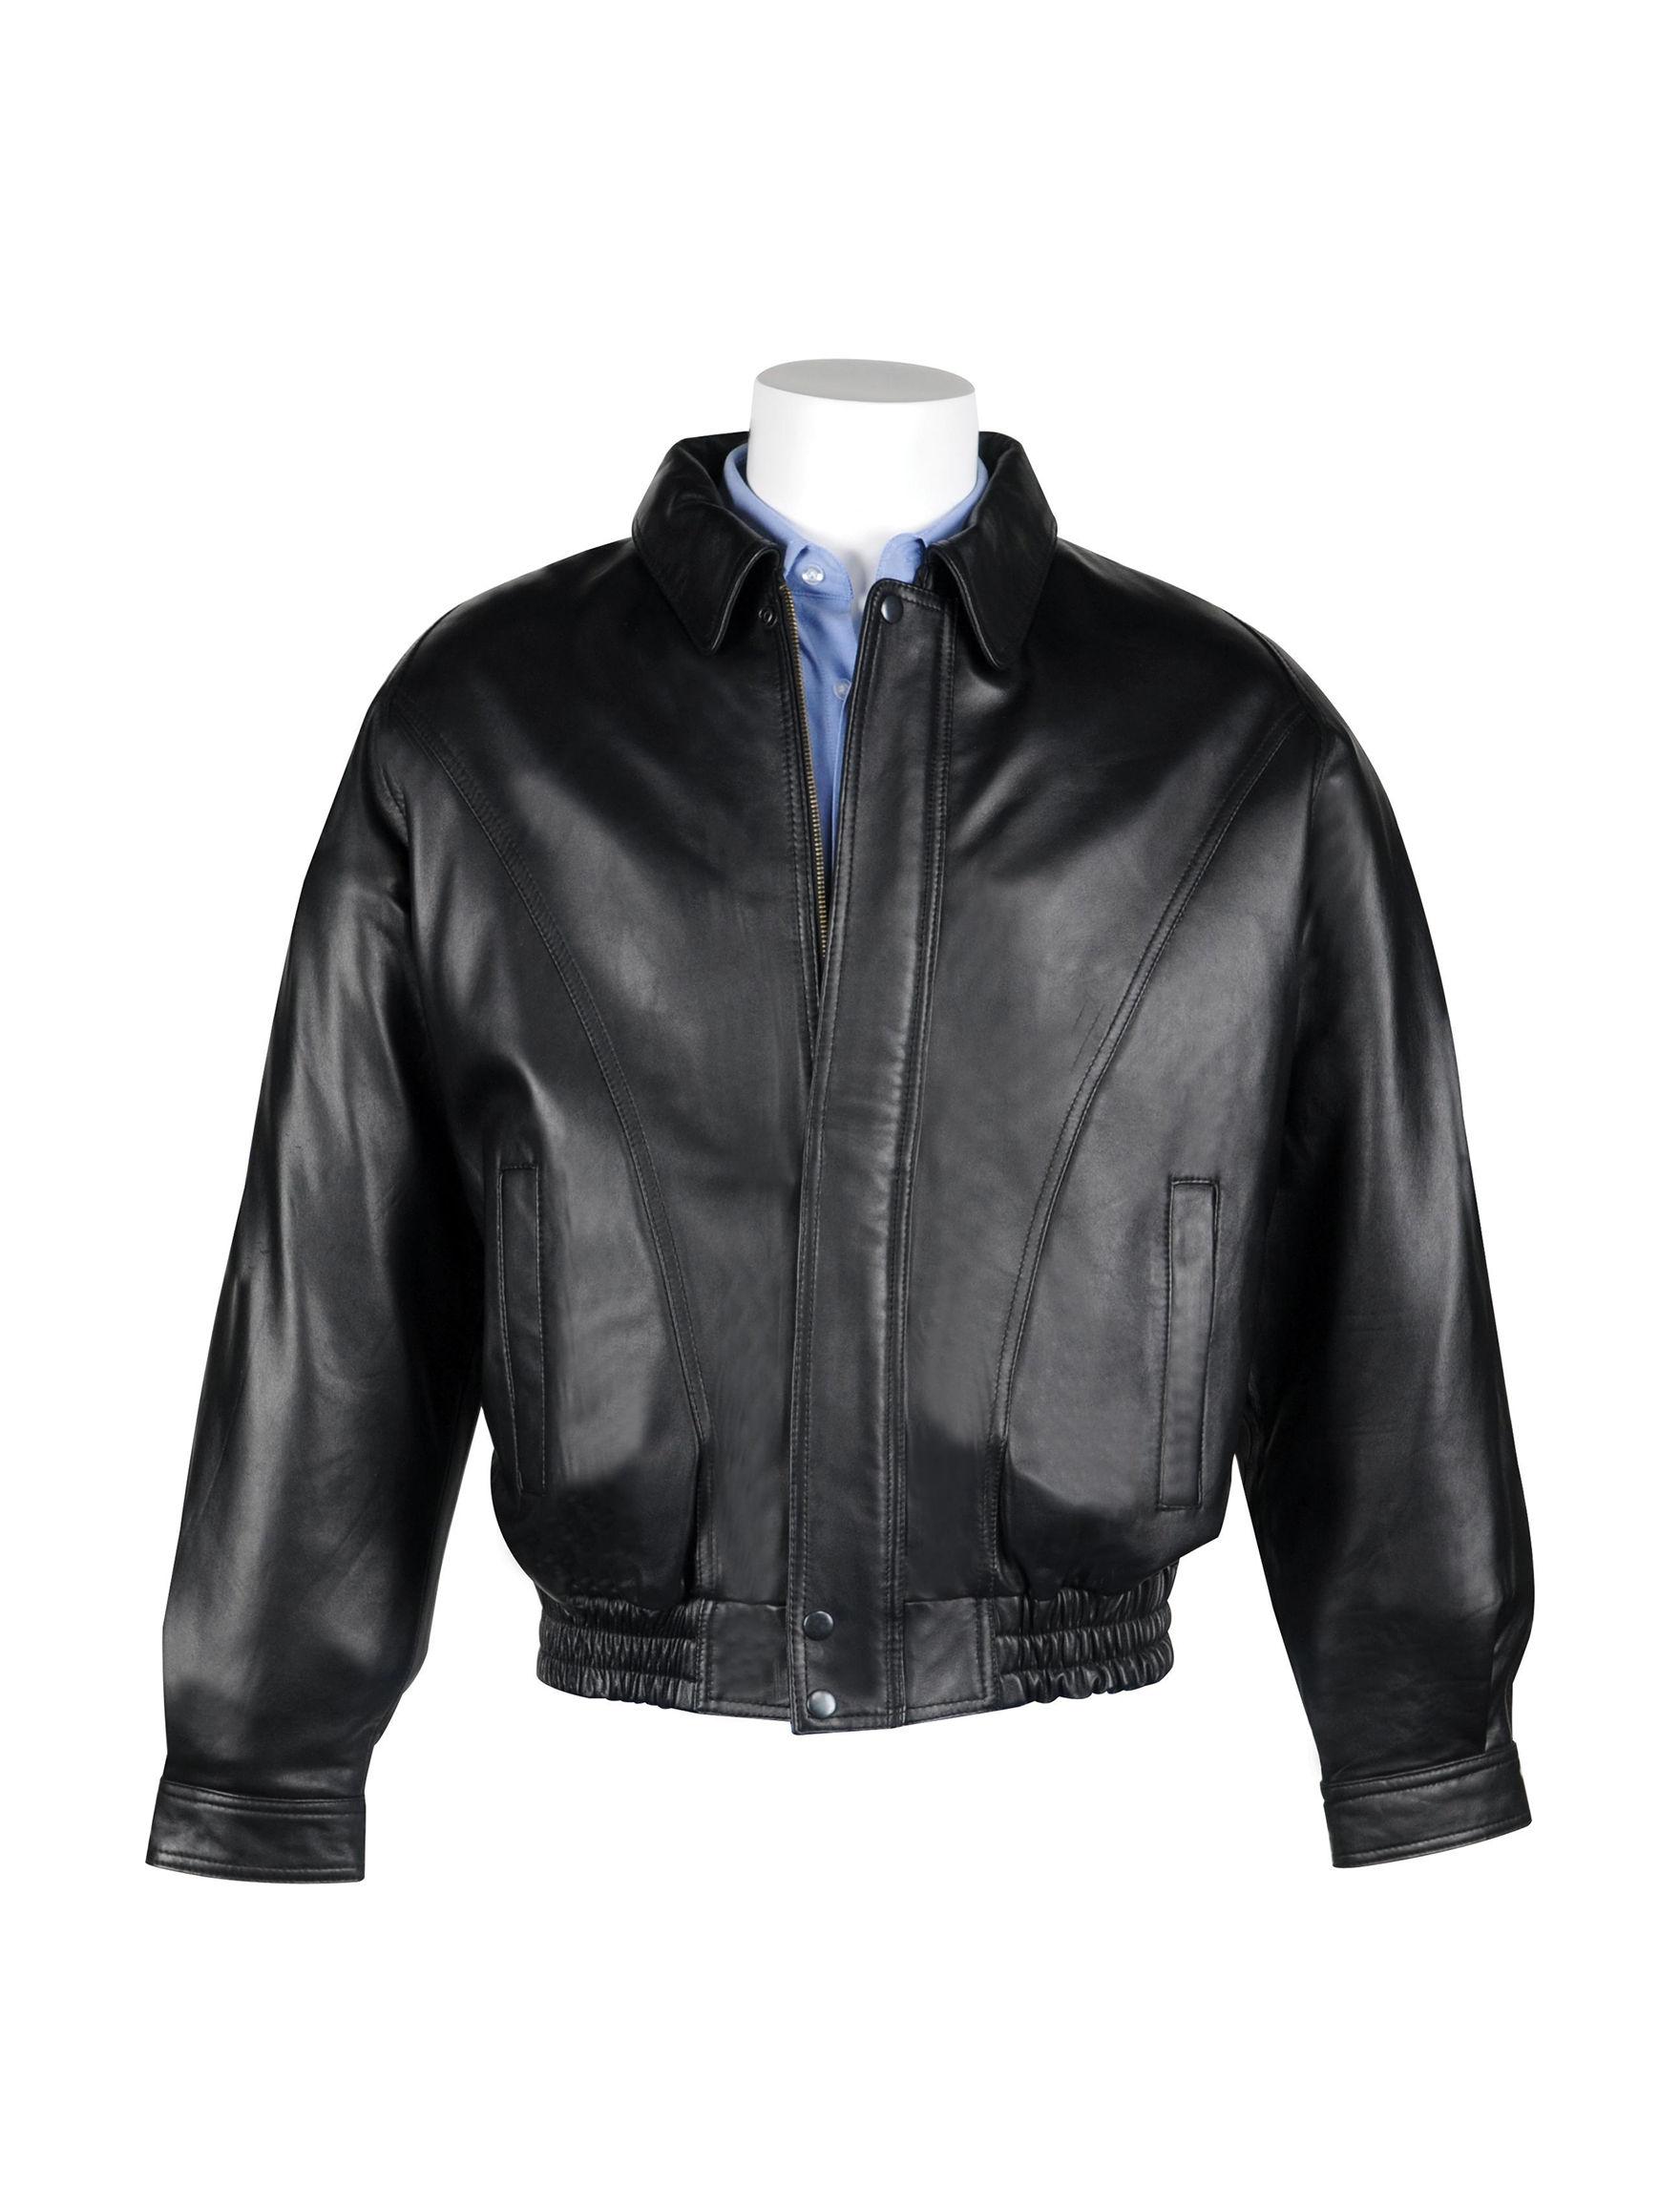 Vintage Leather Black Bomber & Moto Jackets